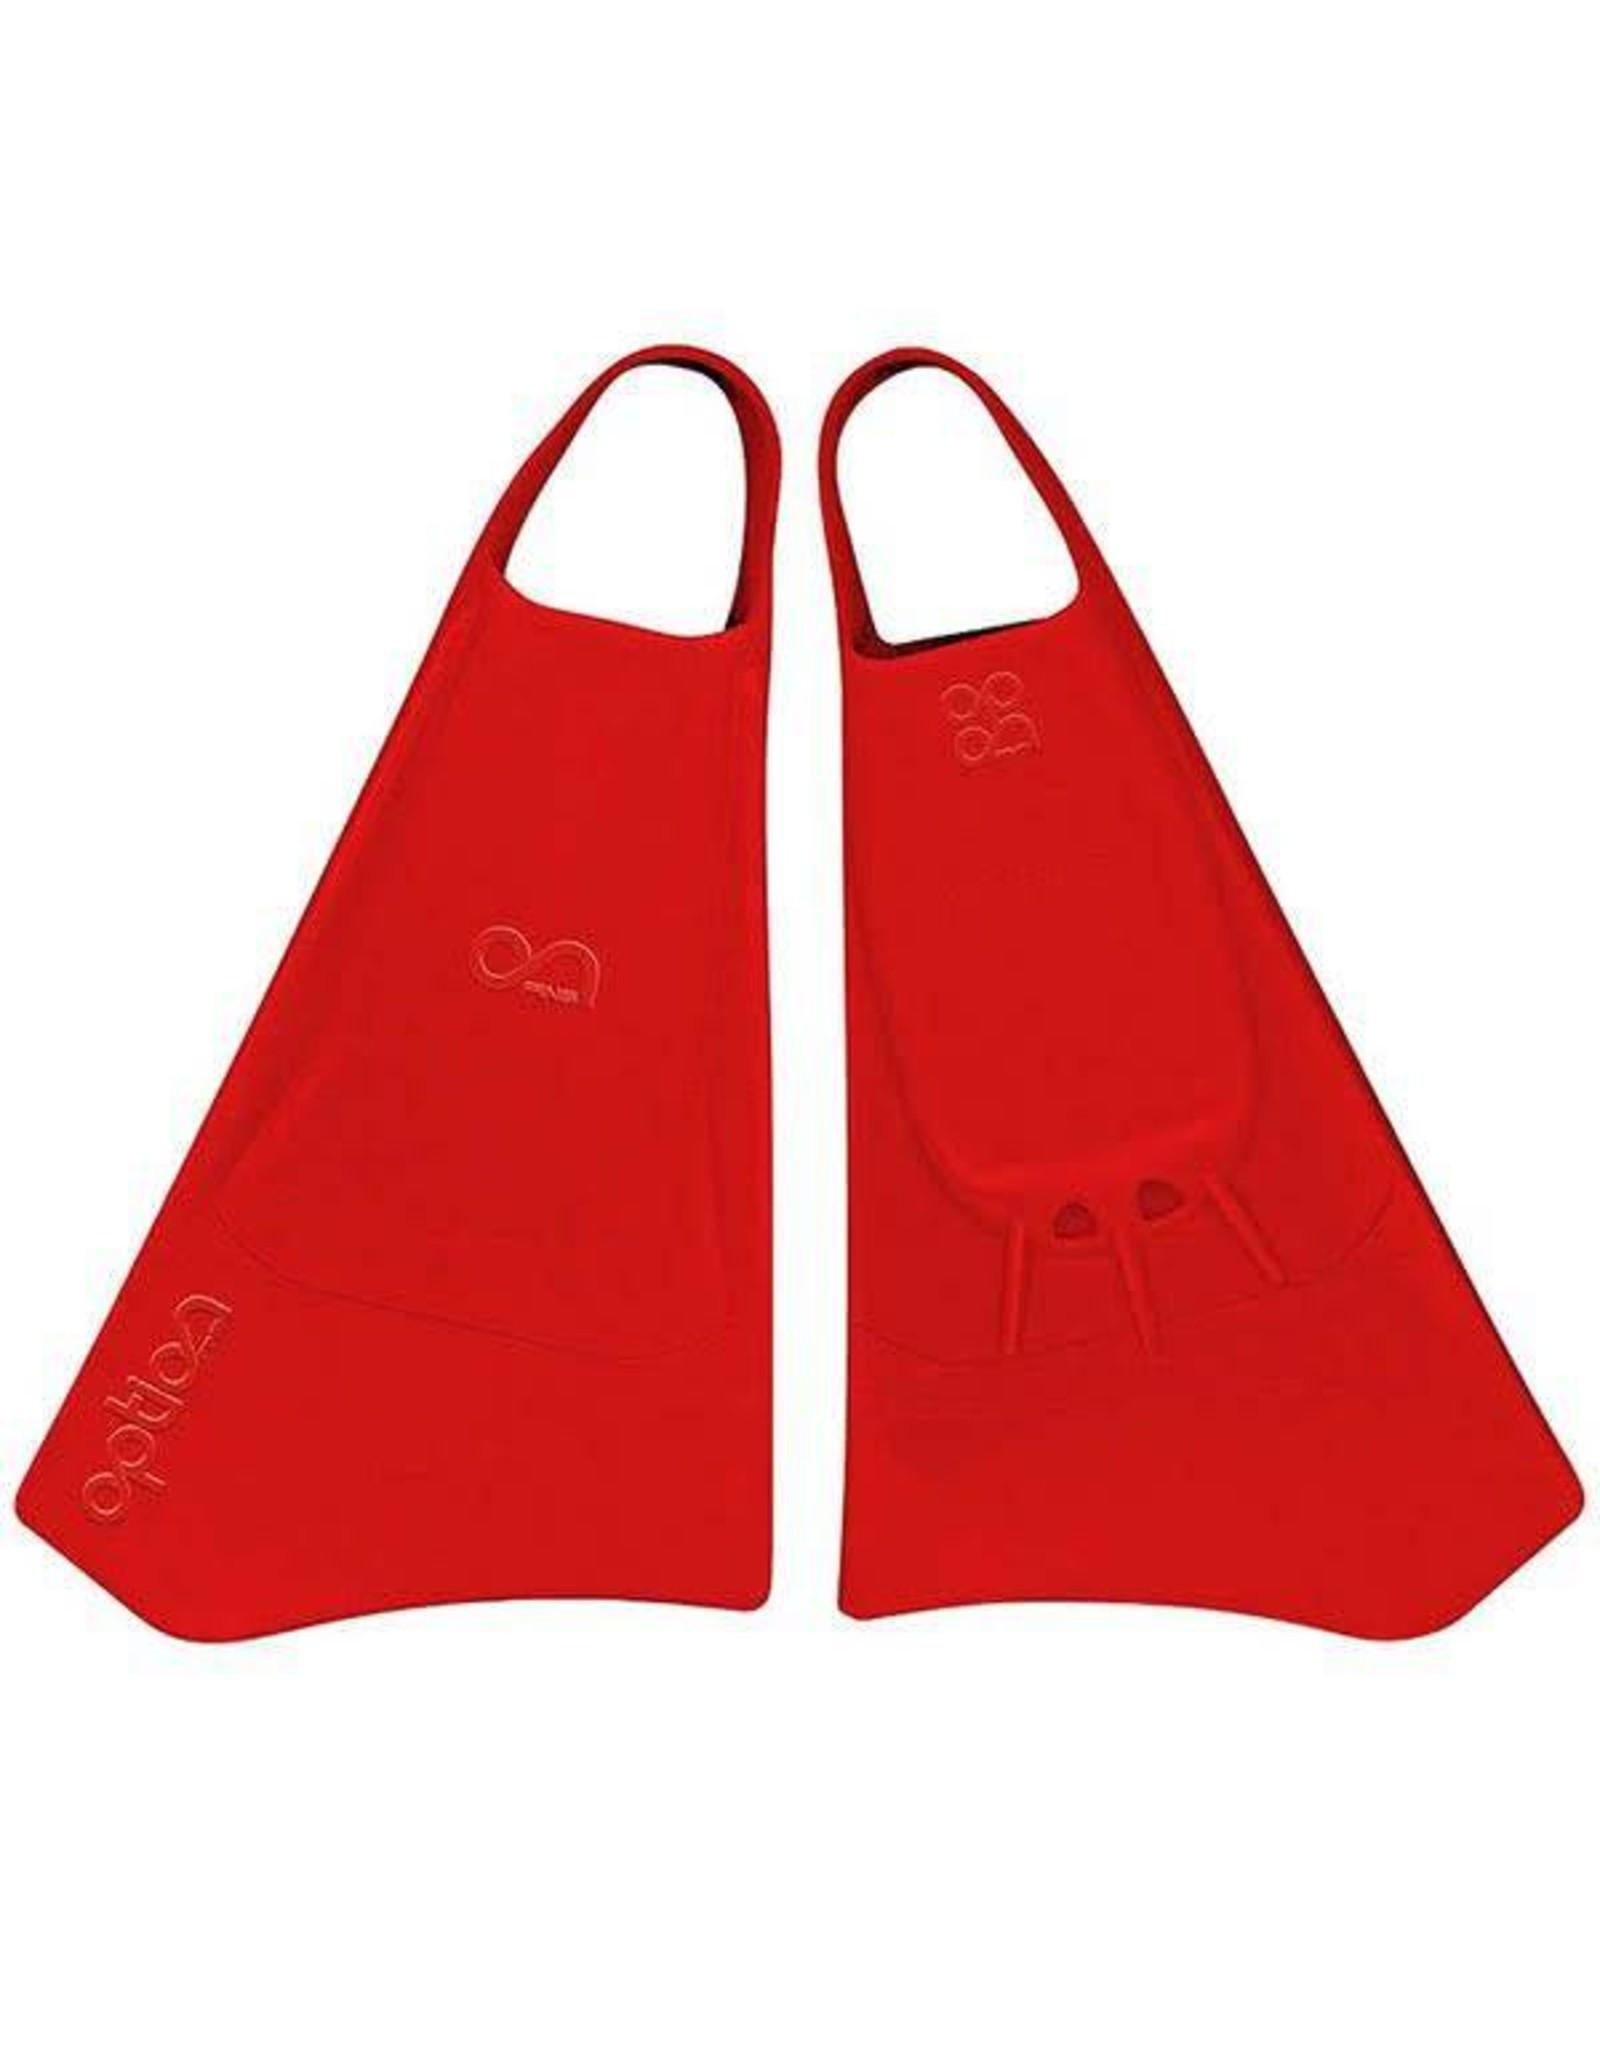 Option Option Bodyboard Fins 40-42 Rood